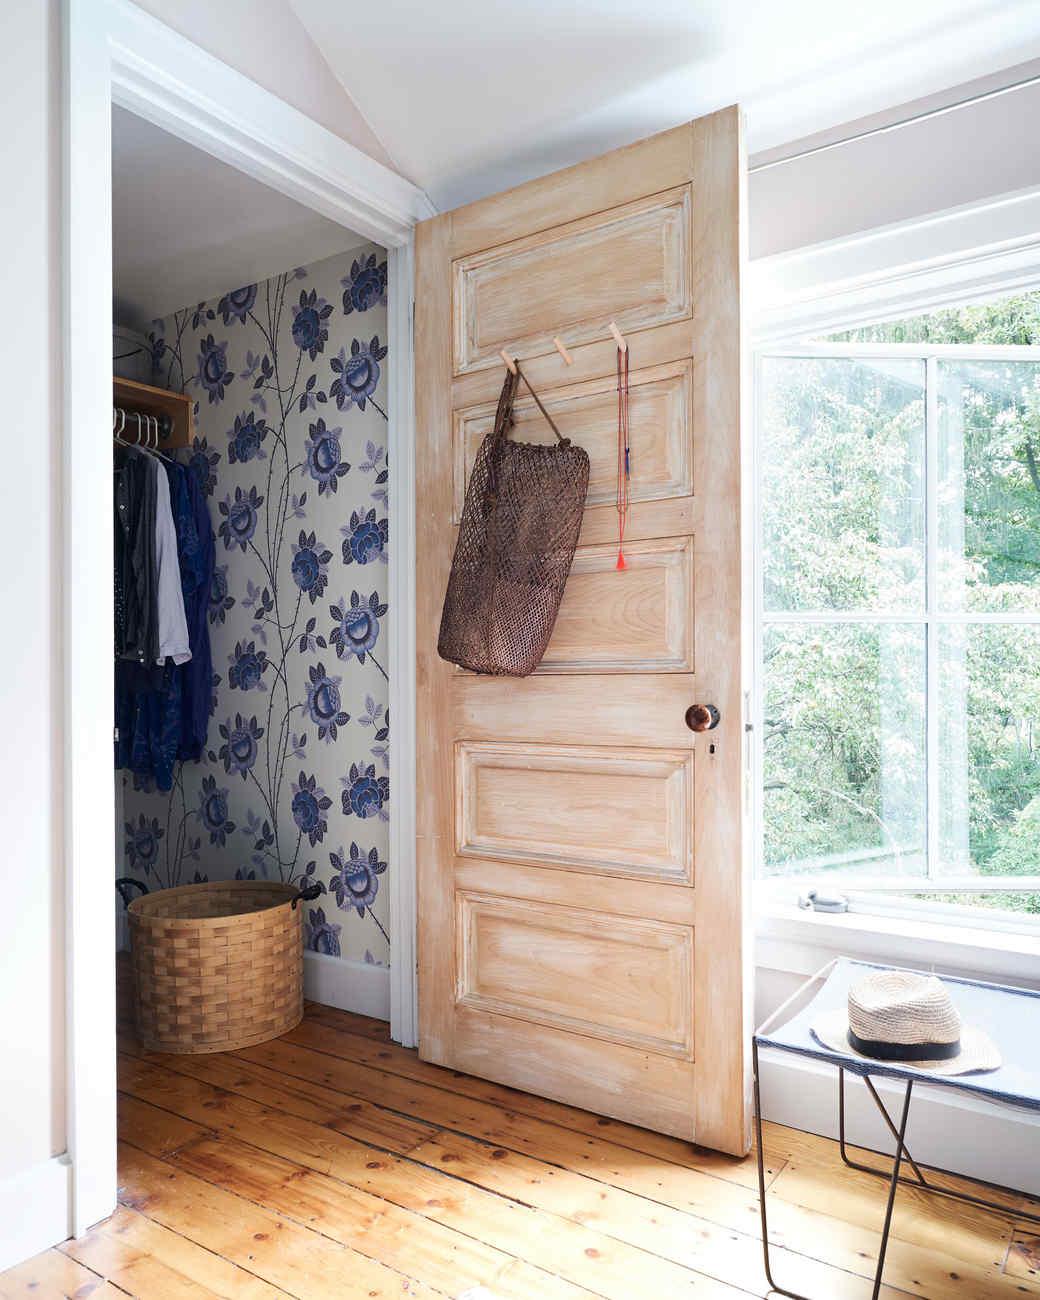 bedroom closet with refurbished door and blue floral wallpaper